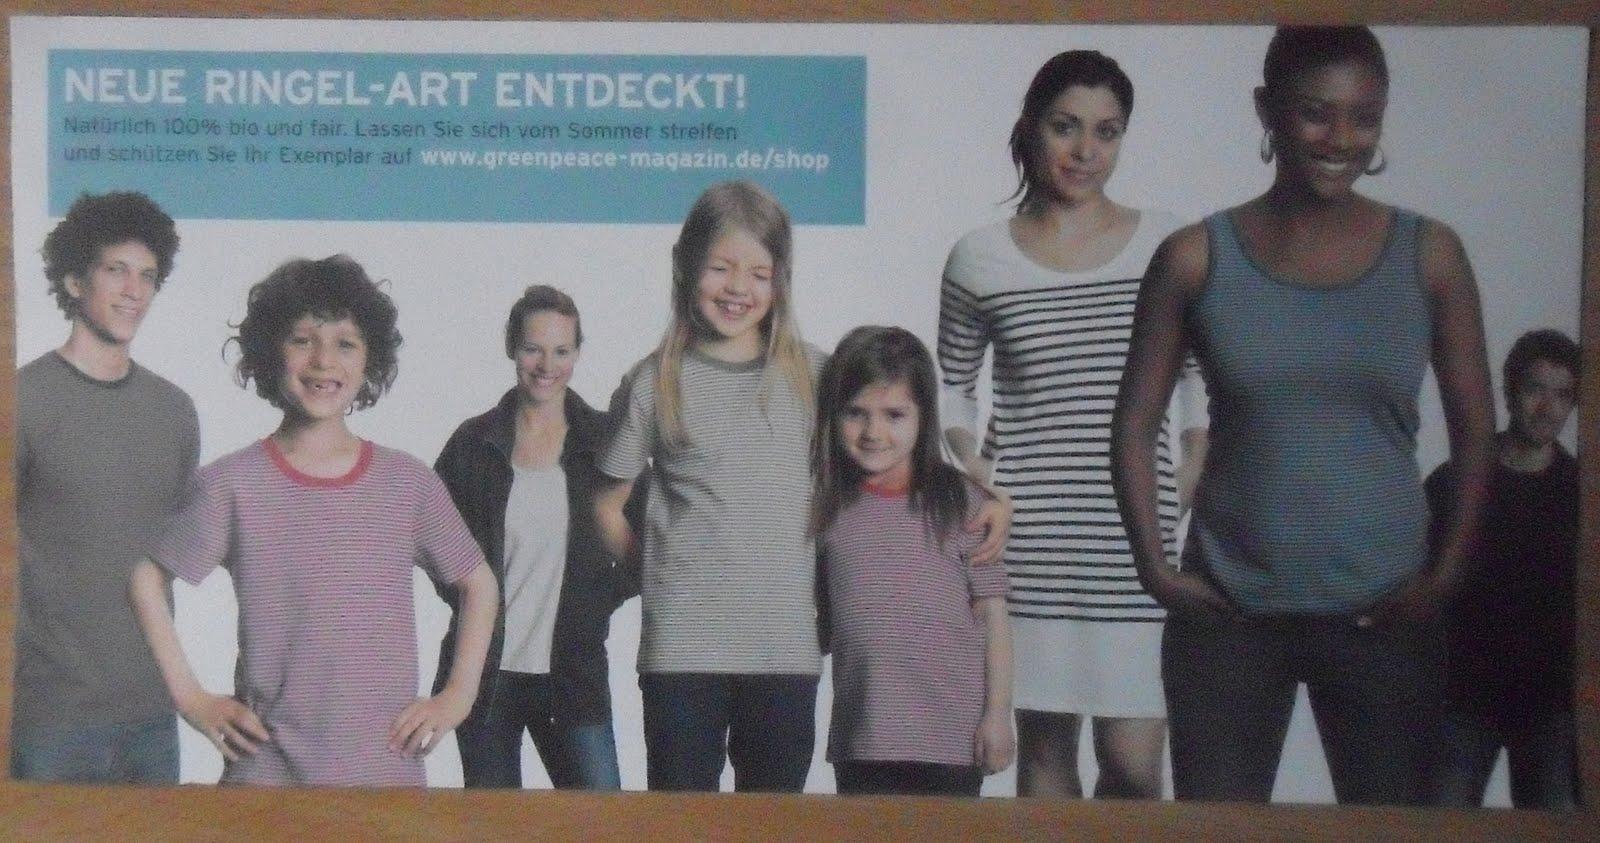 Greenpeace Werbung